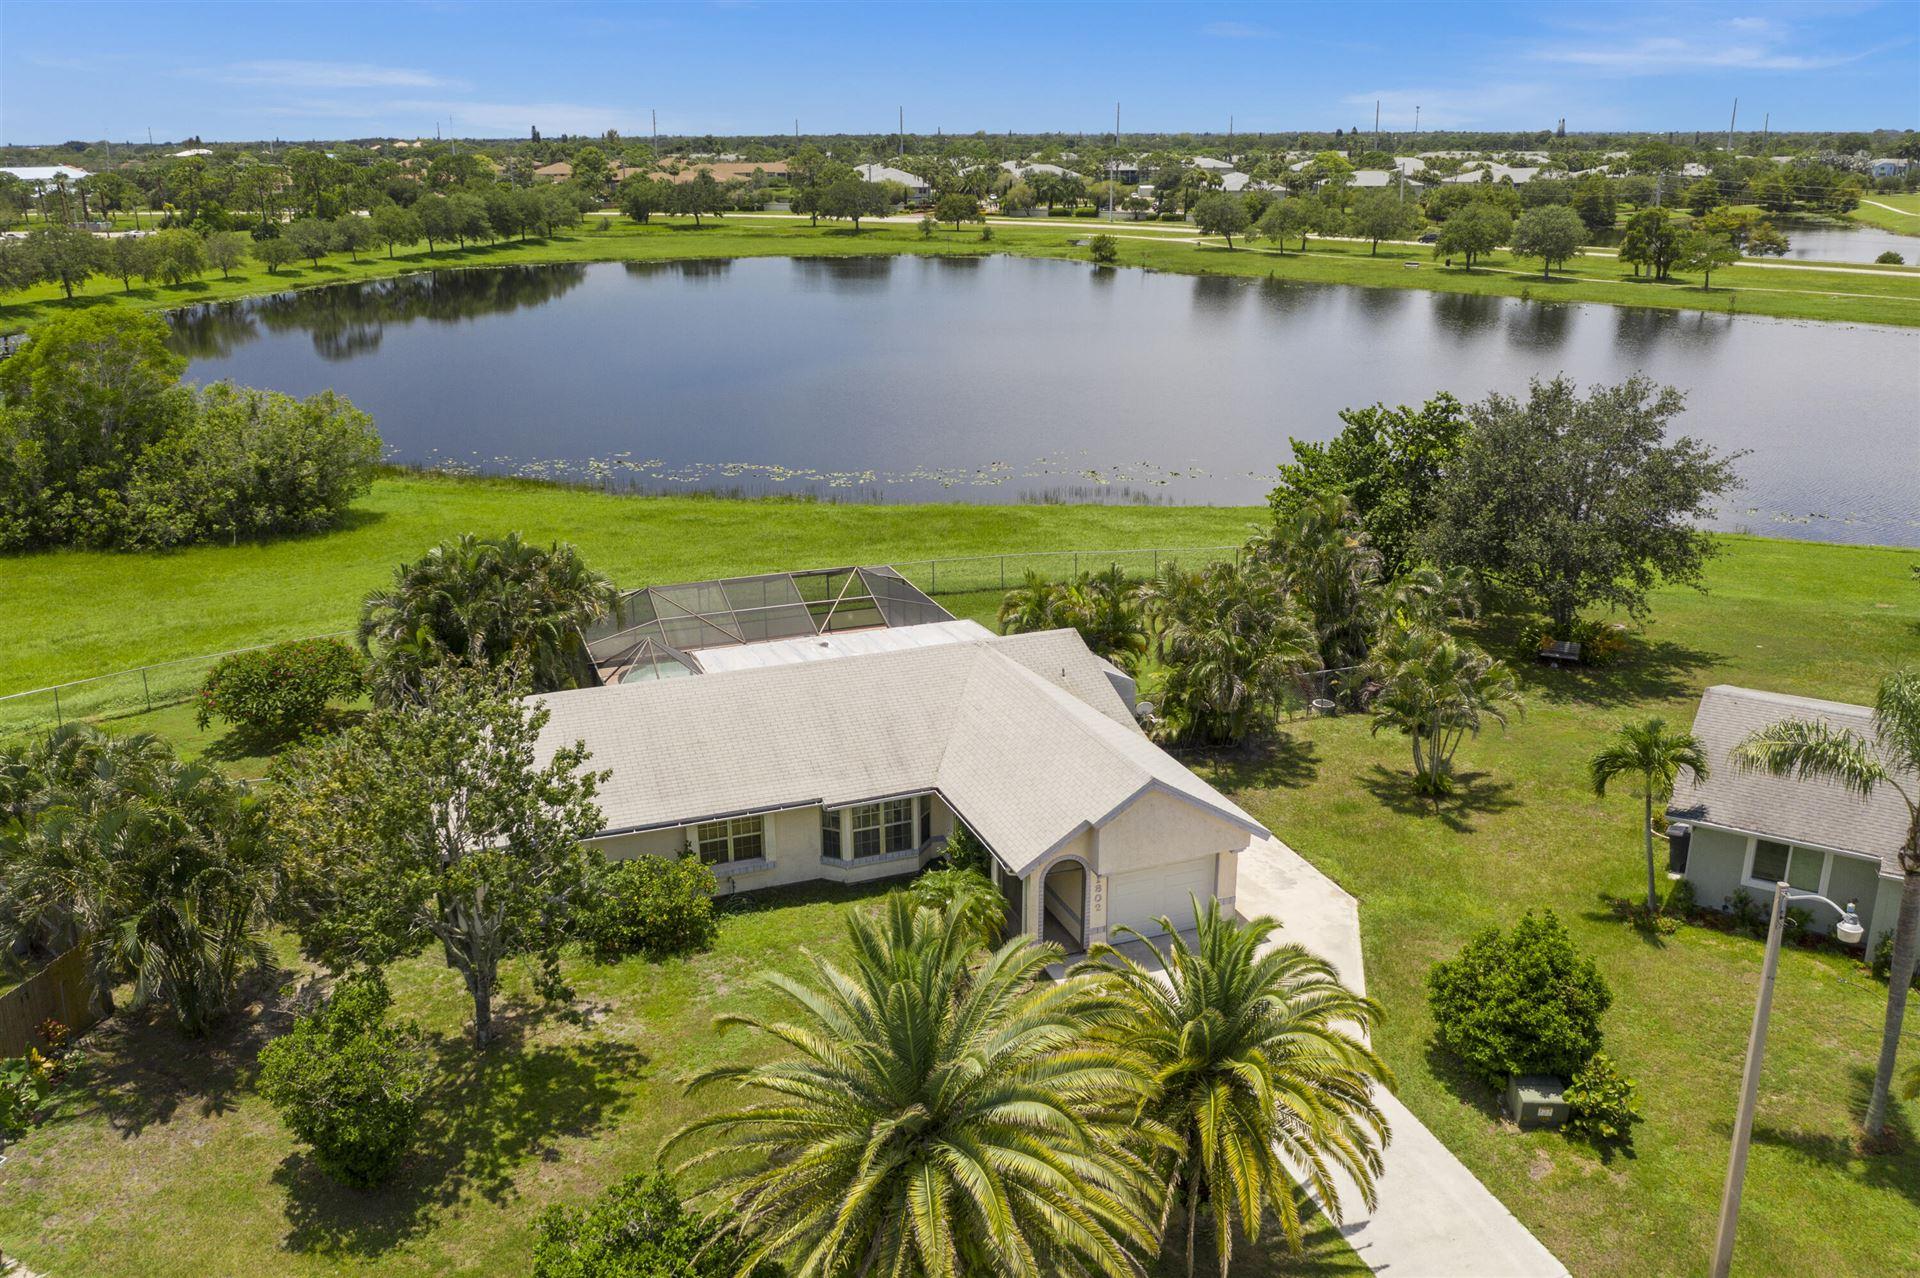 1802 SE Wexford Court, Port Saint Lucie, FL 34952 - MLS#: RX-10733340